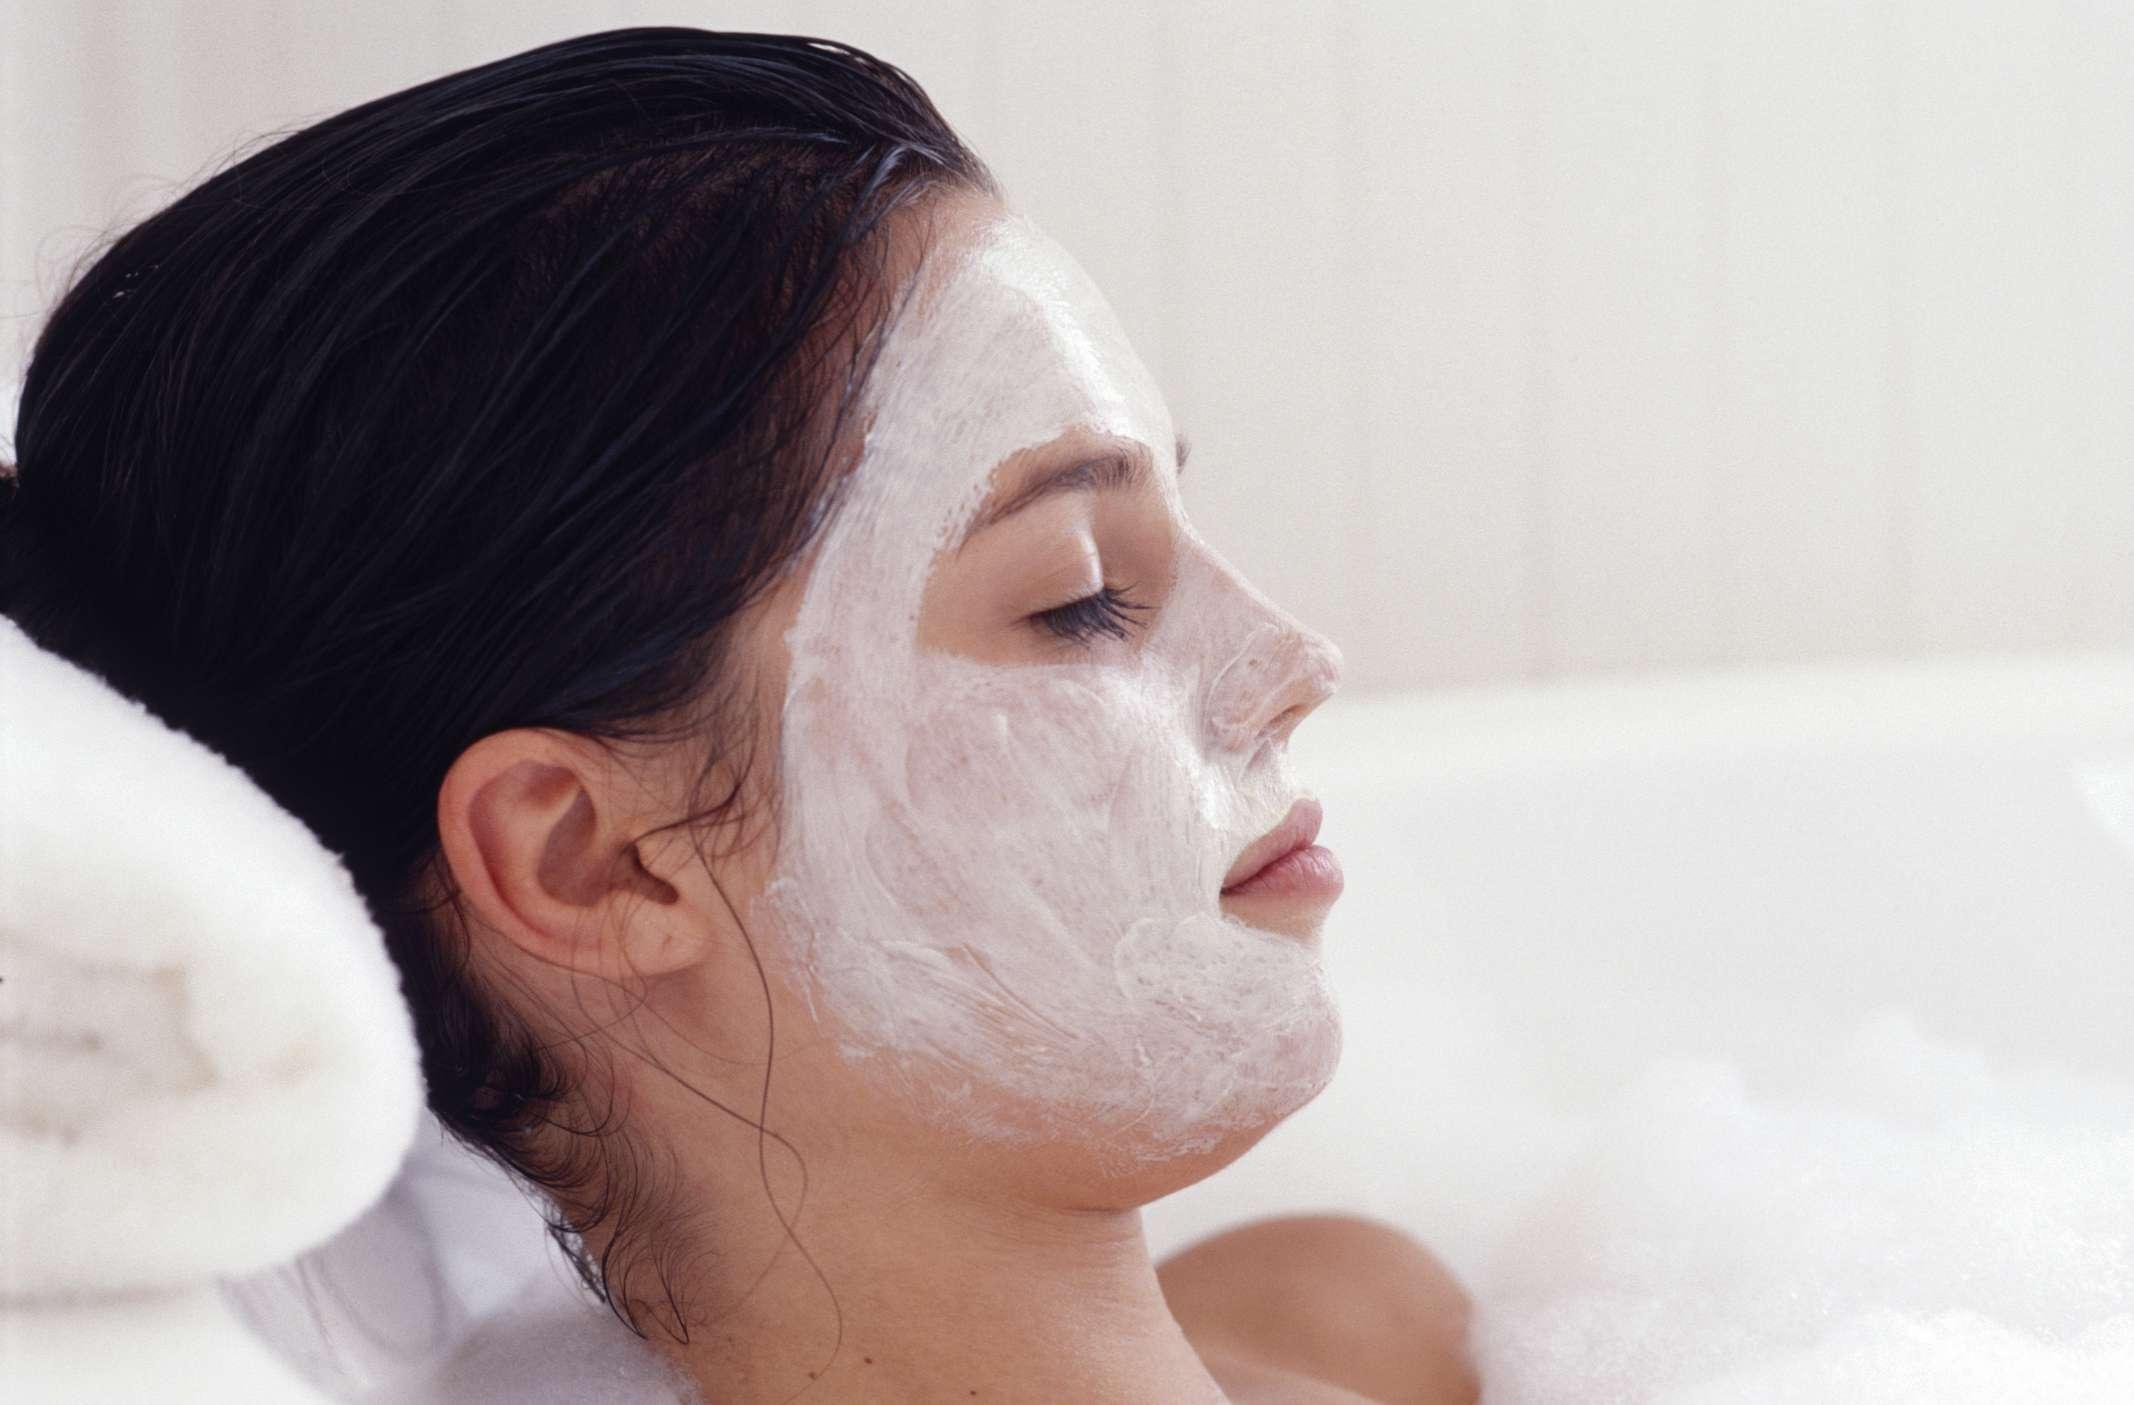 face mask and bubble bath